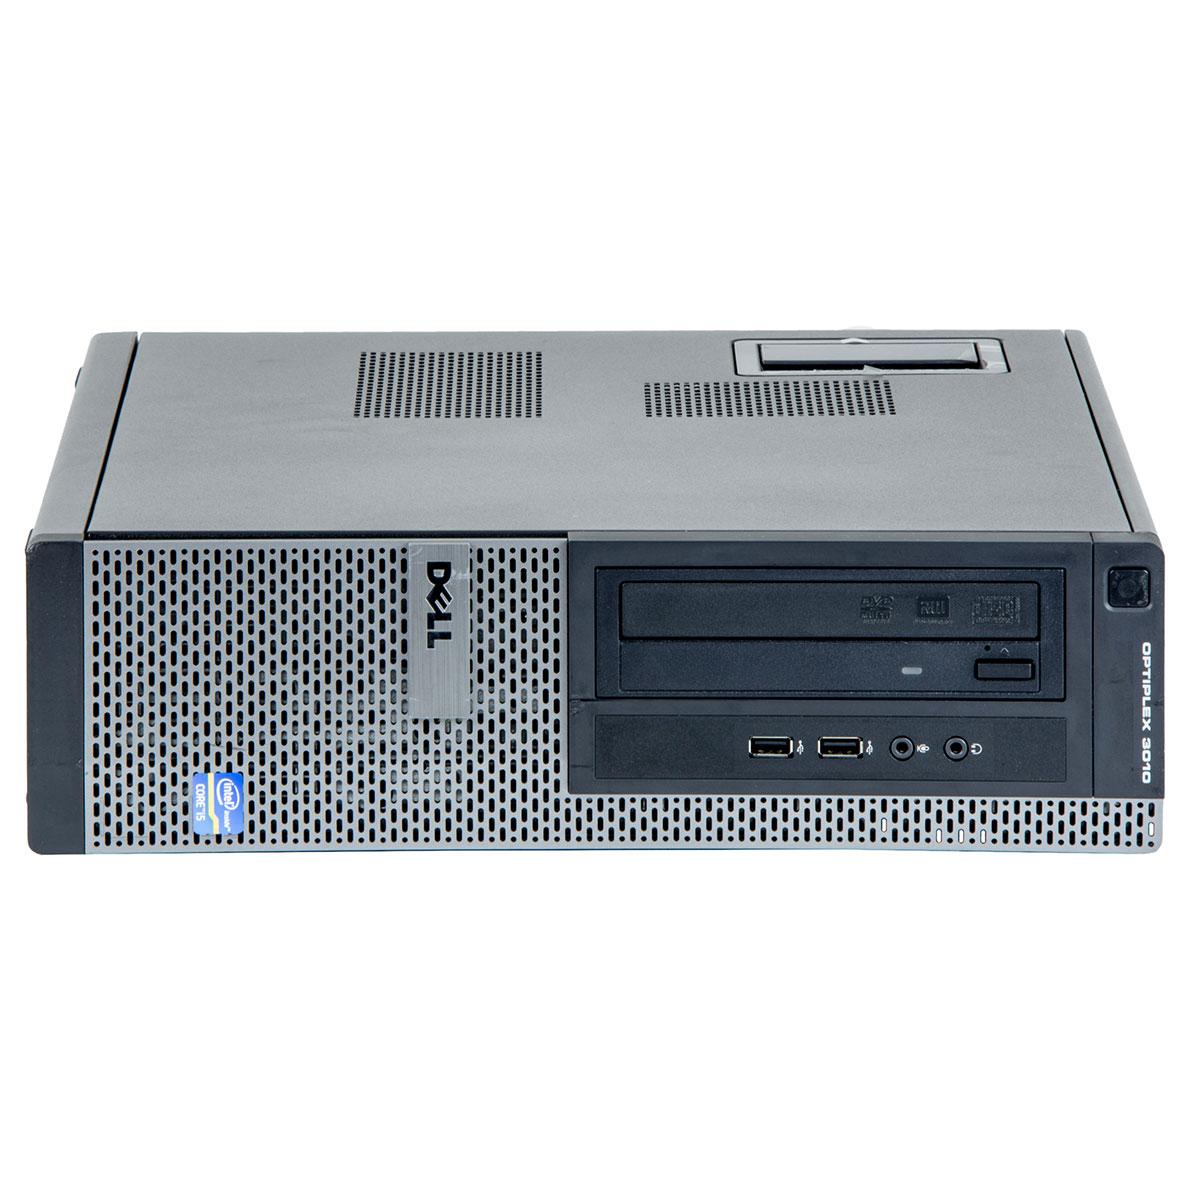 Dell Optiplex 3010 Intel Pentium Dual Core G645 2.